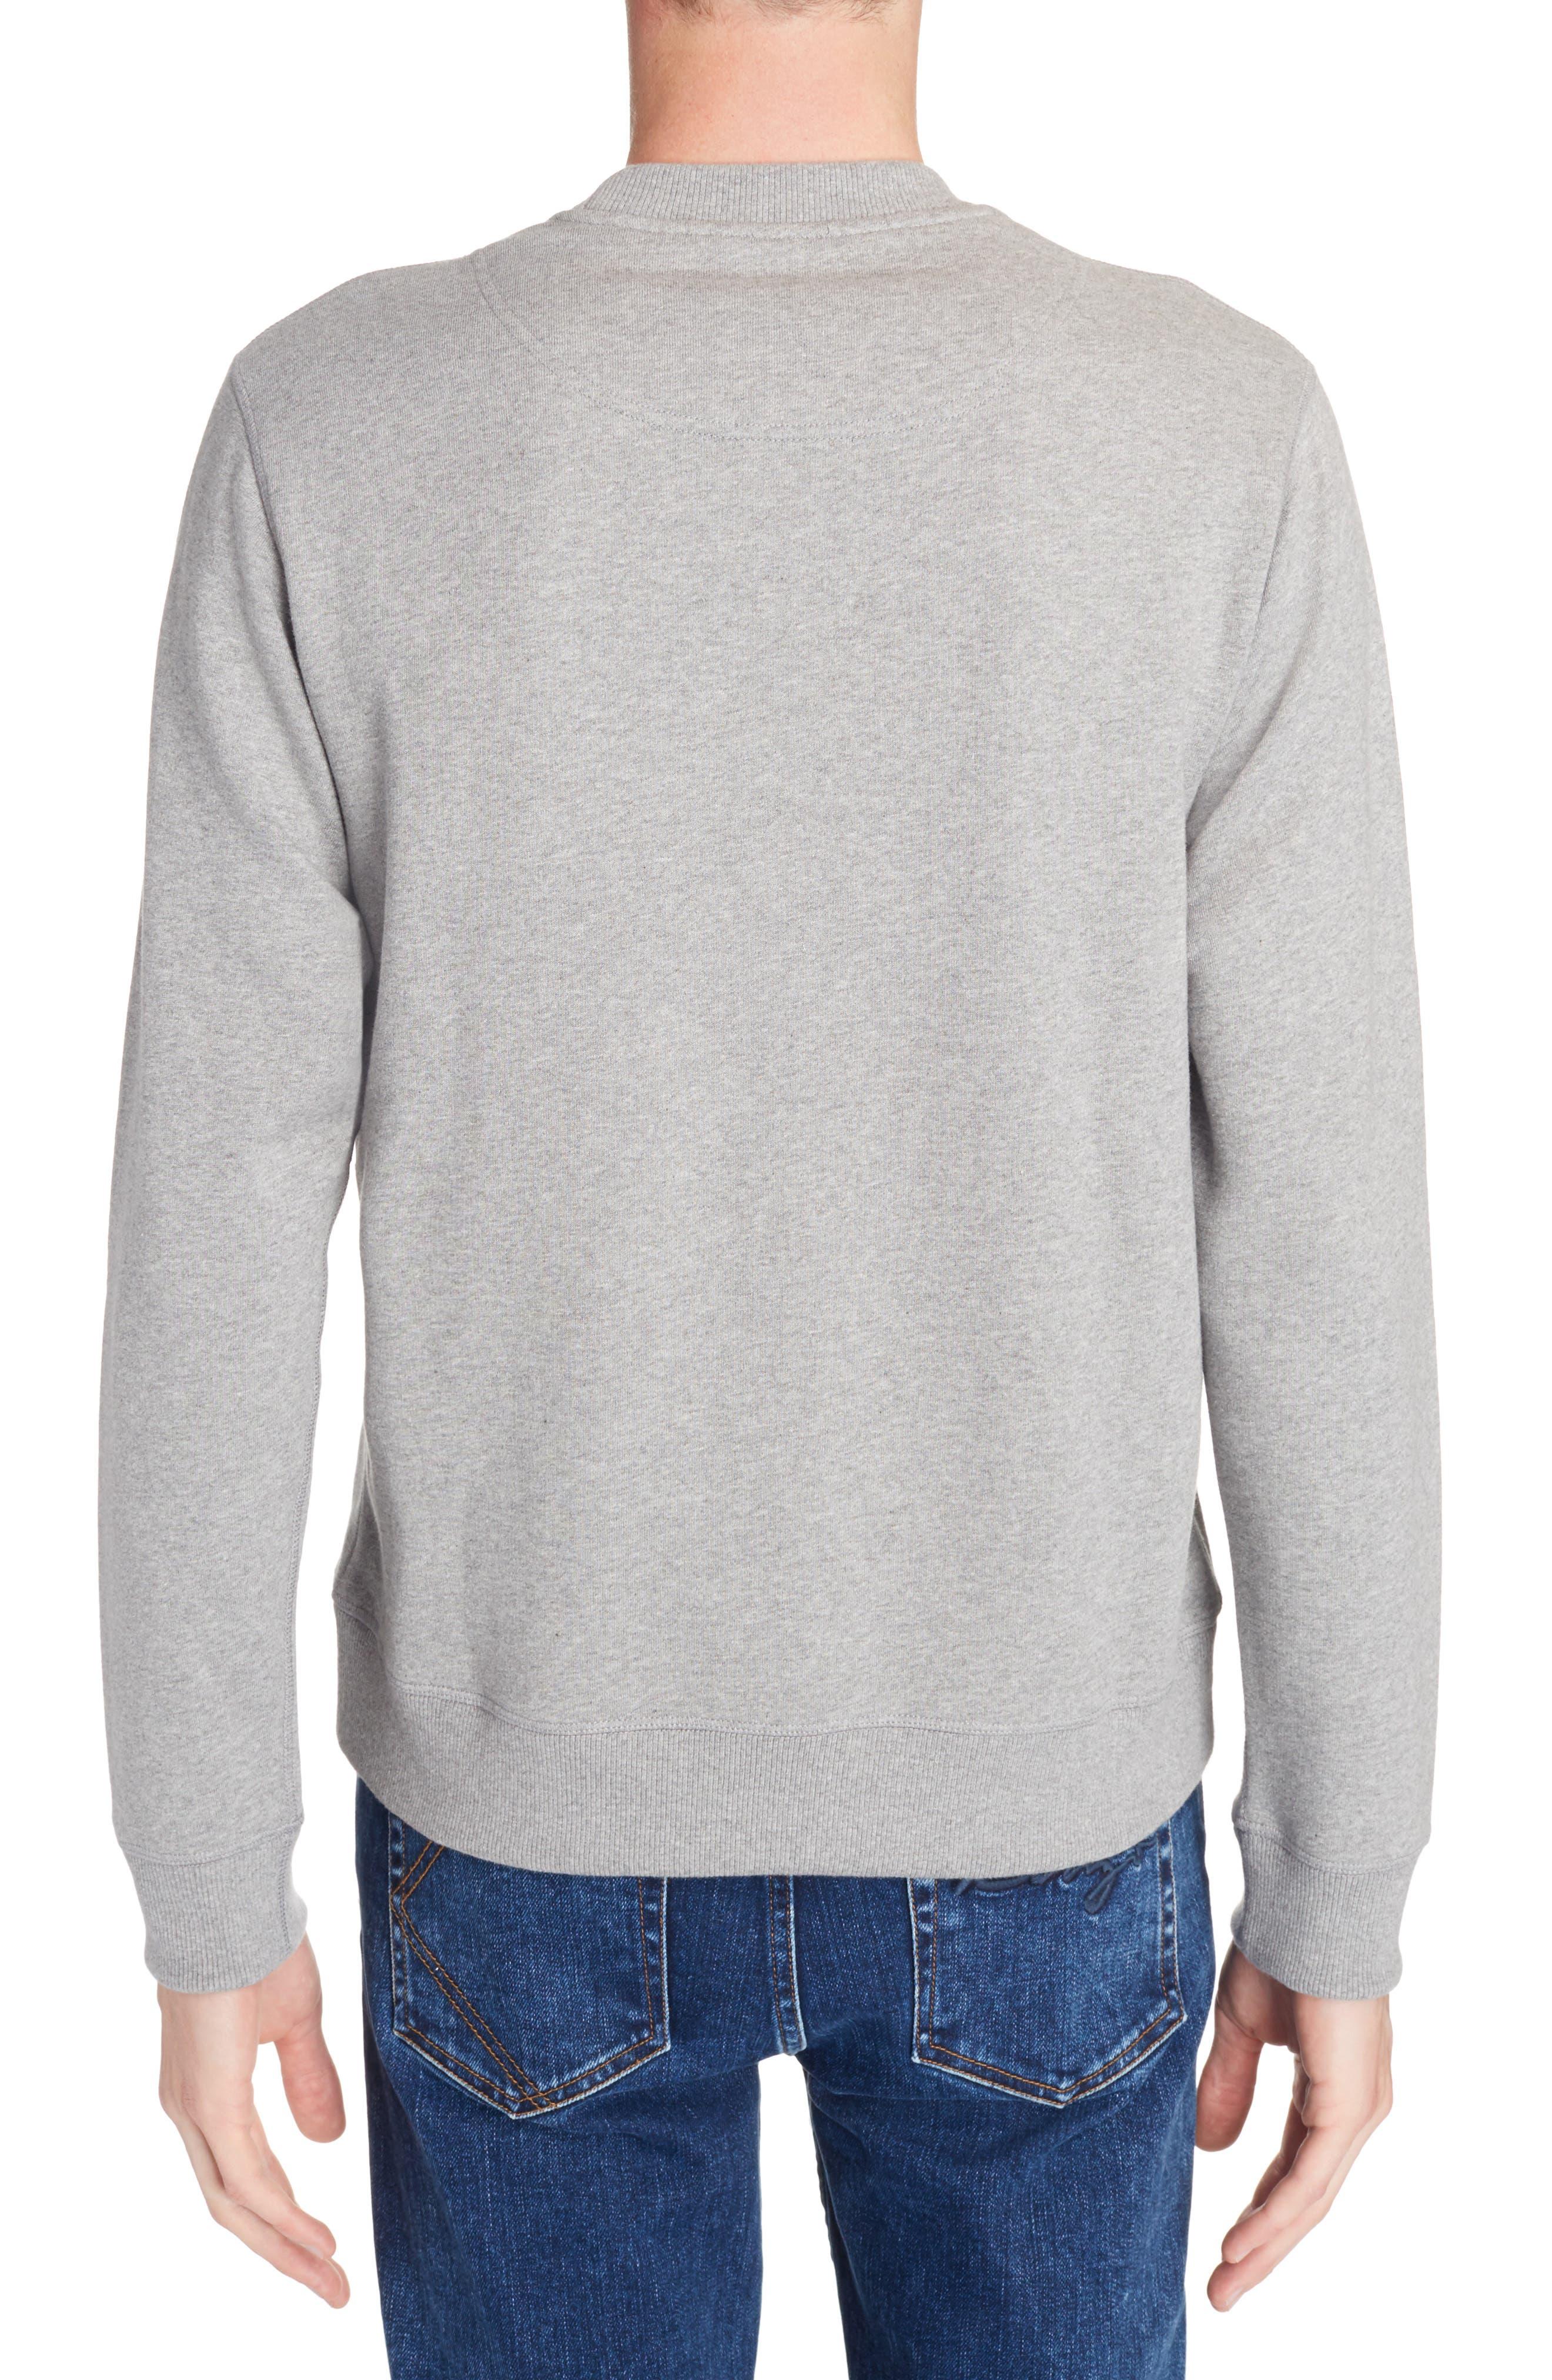 Rainbow Tiger Crewneck Sweatshirt,                             Alternate thumbnail 2, color,                             Dove Grey